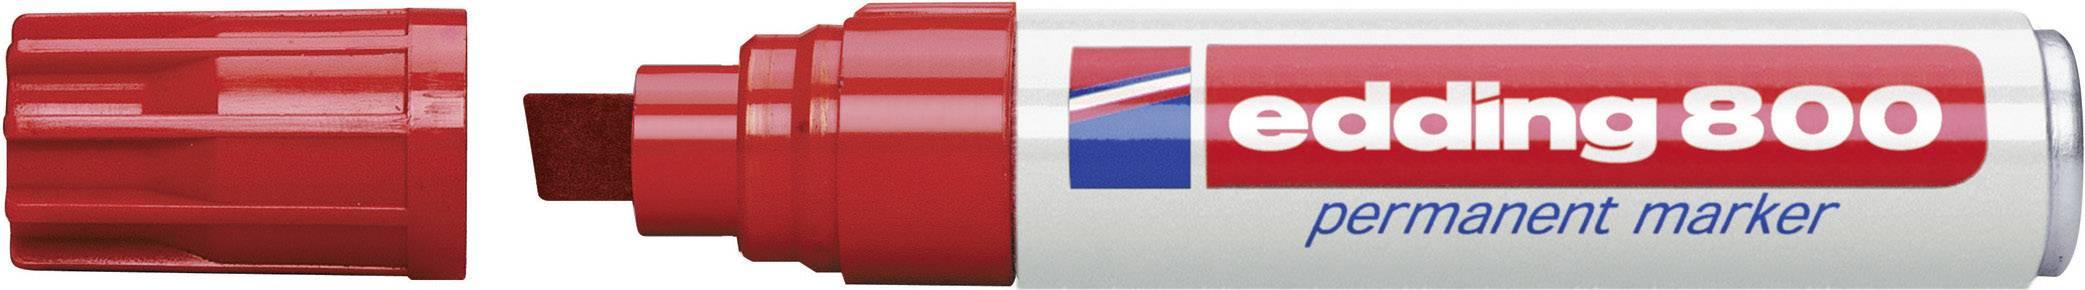 Trvanlivý popisovač edding 800- červená